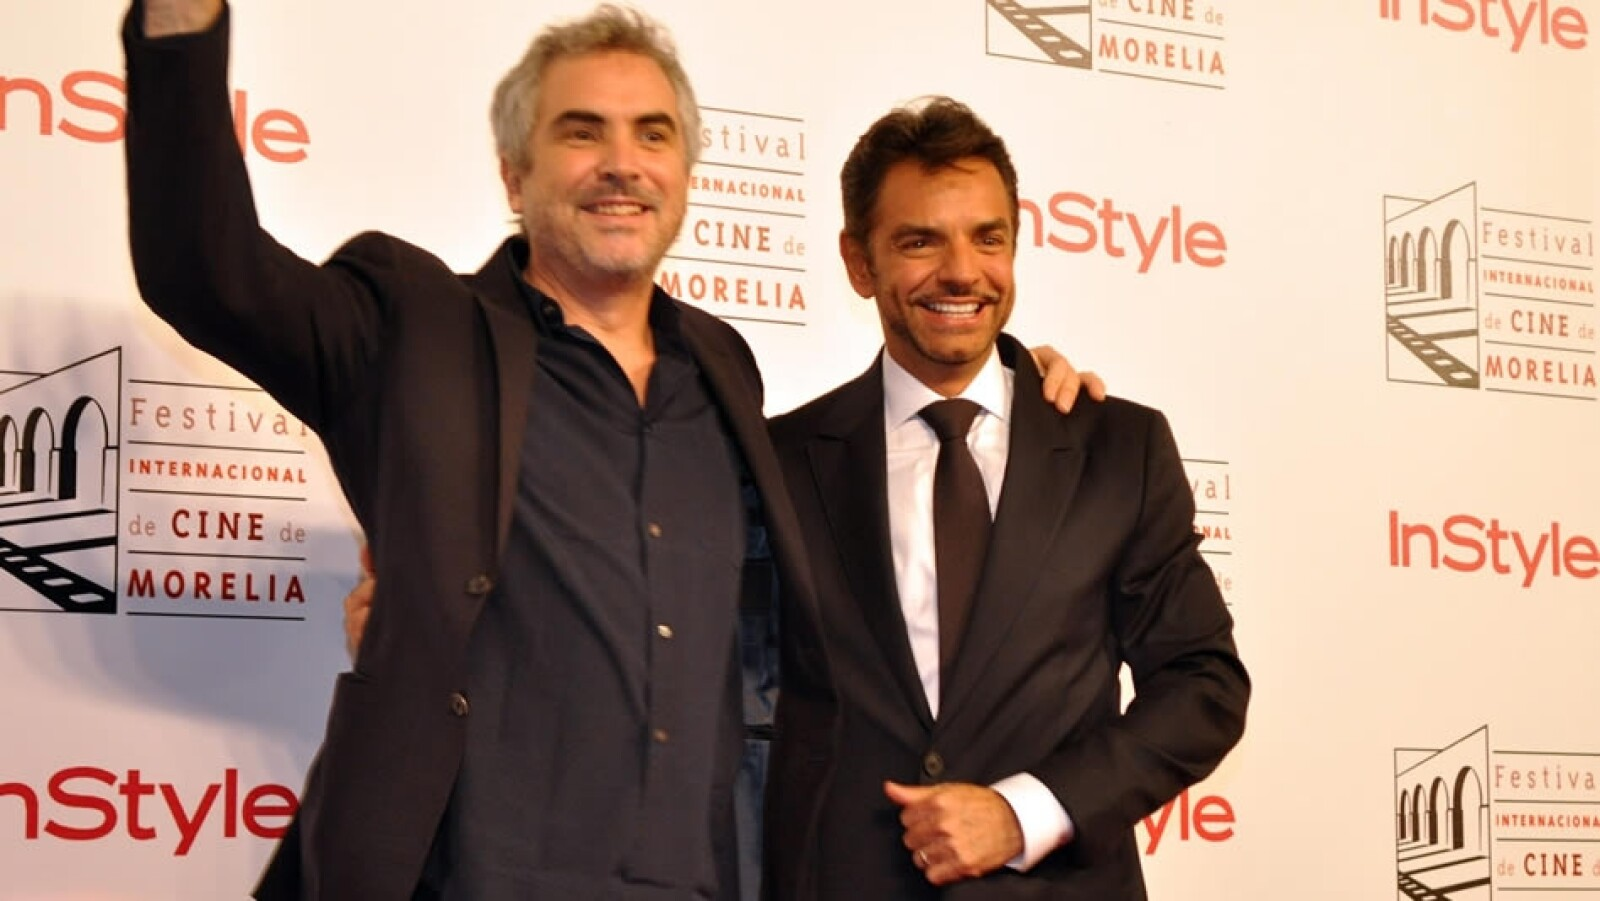 FIC Morelia 2013 2